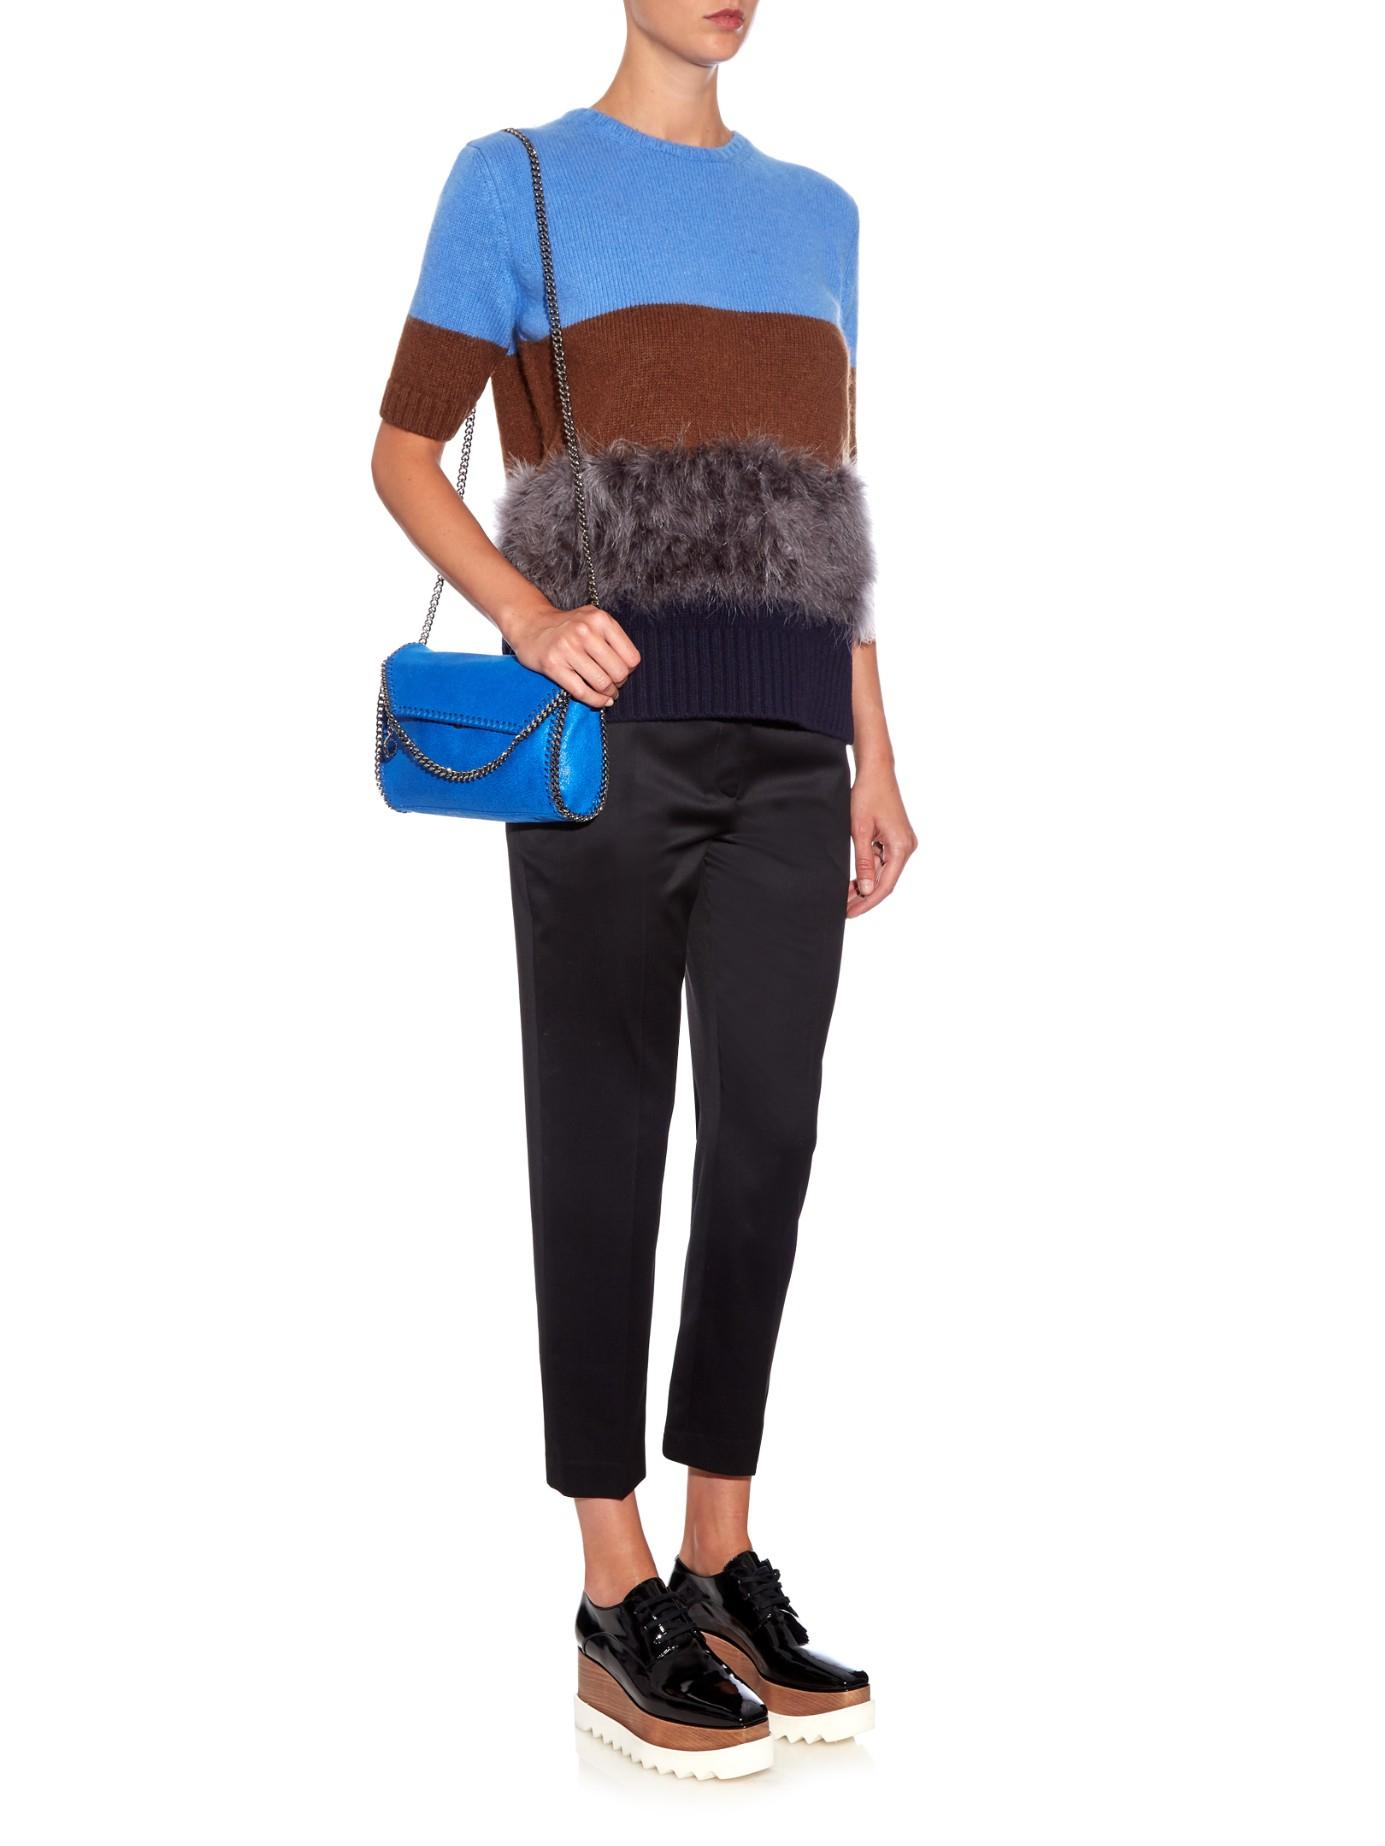 4e6f14452a Lyst - Stella McCartney Falabella Small Faux-Suede Cross-Body Bag in ...